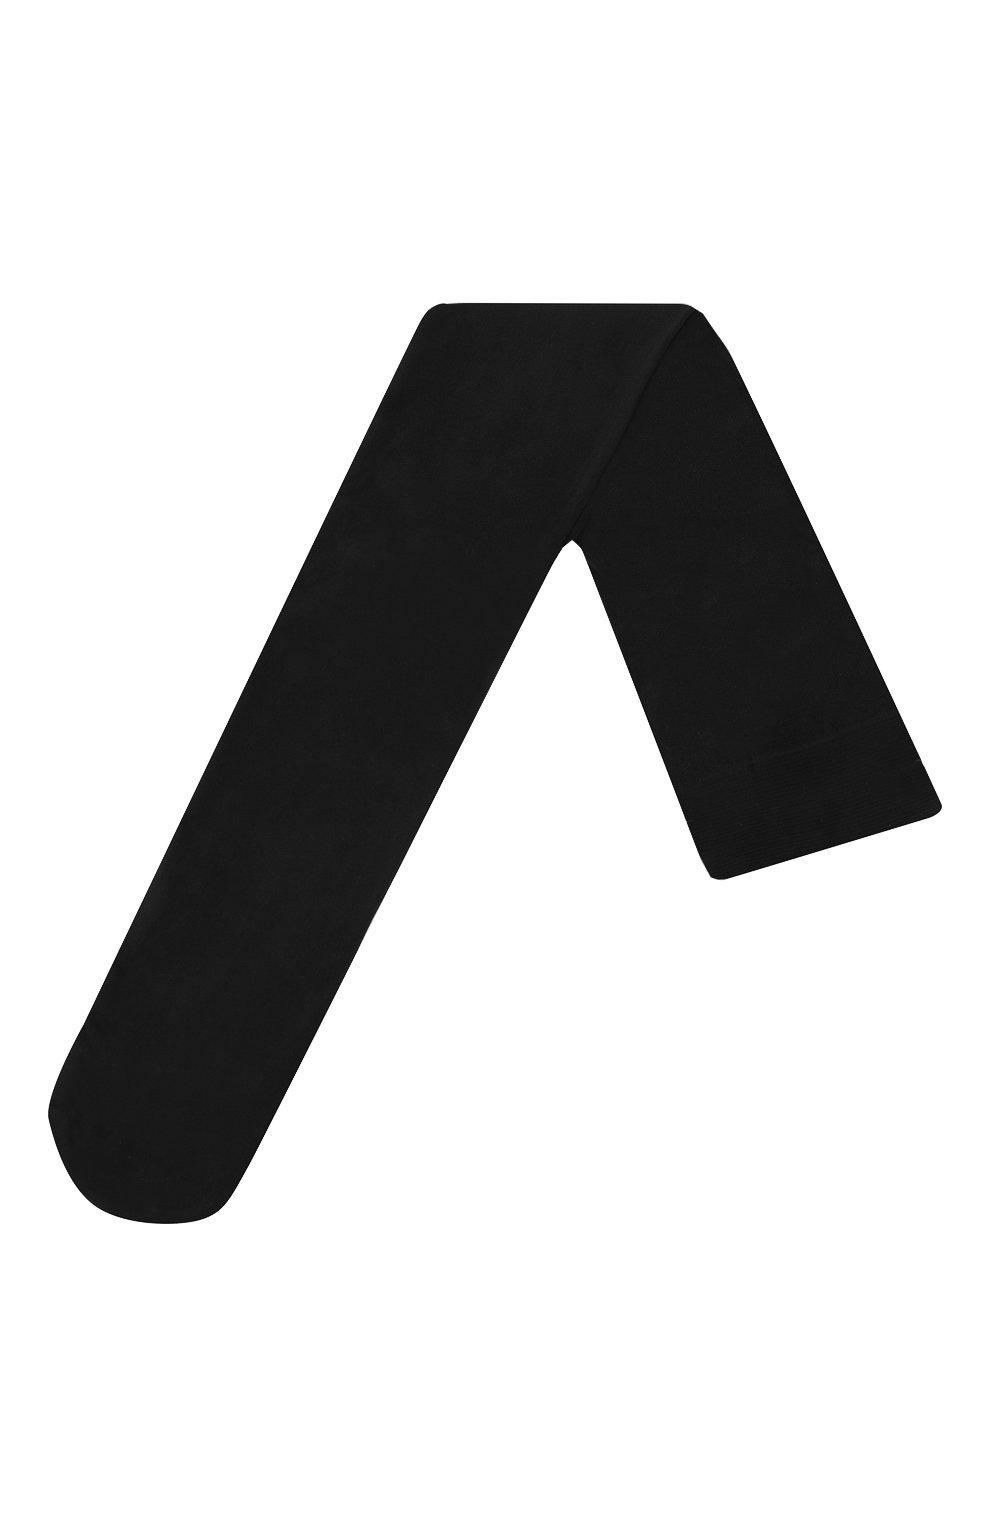 Детские колготки LA PERLA черного цвета, арт. 46105/7-8   Фото 1 (Материал: Текстиль)